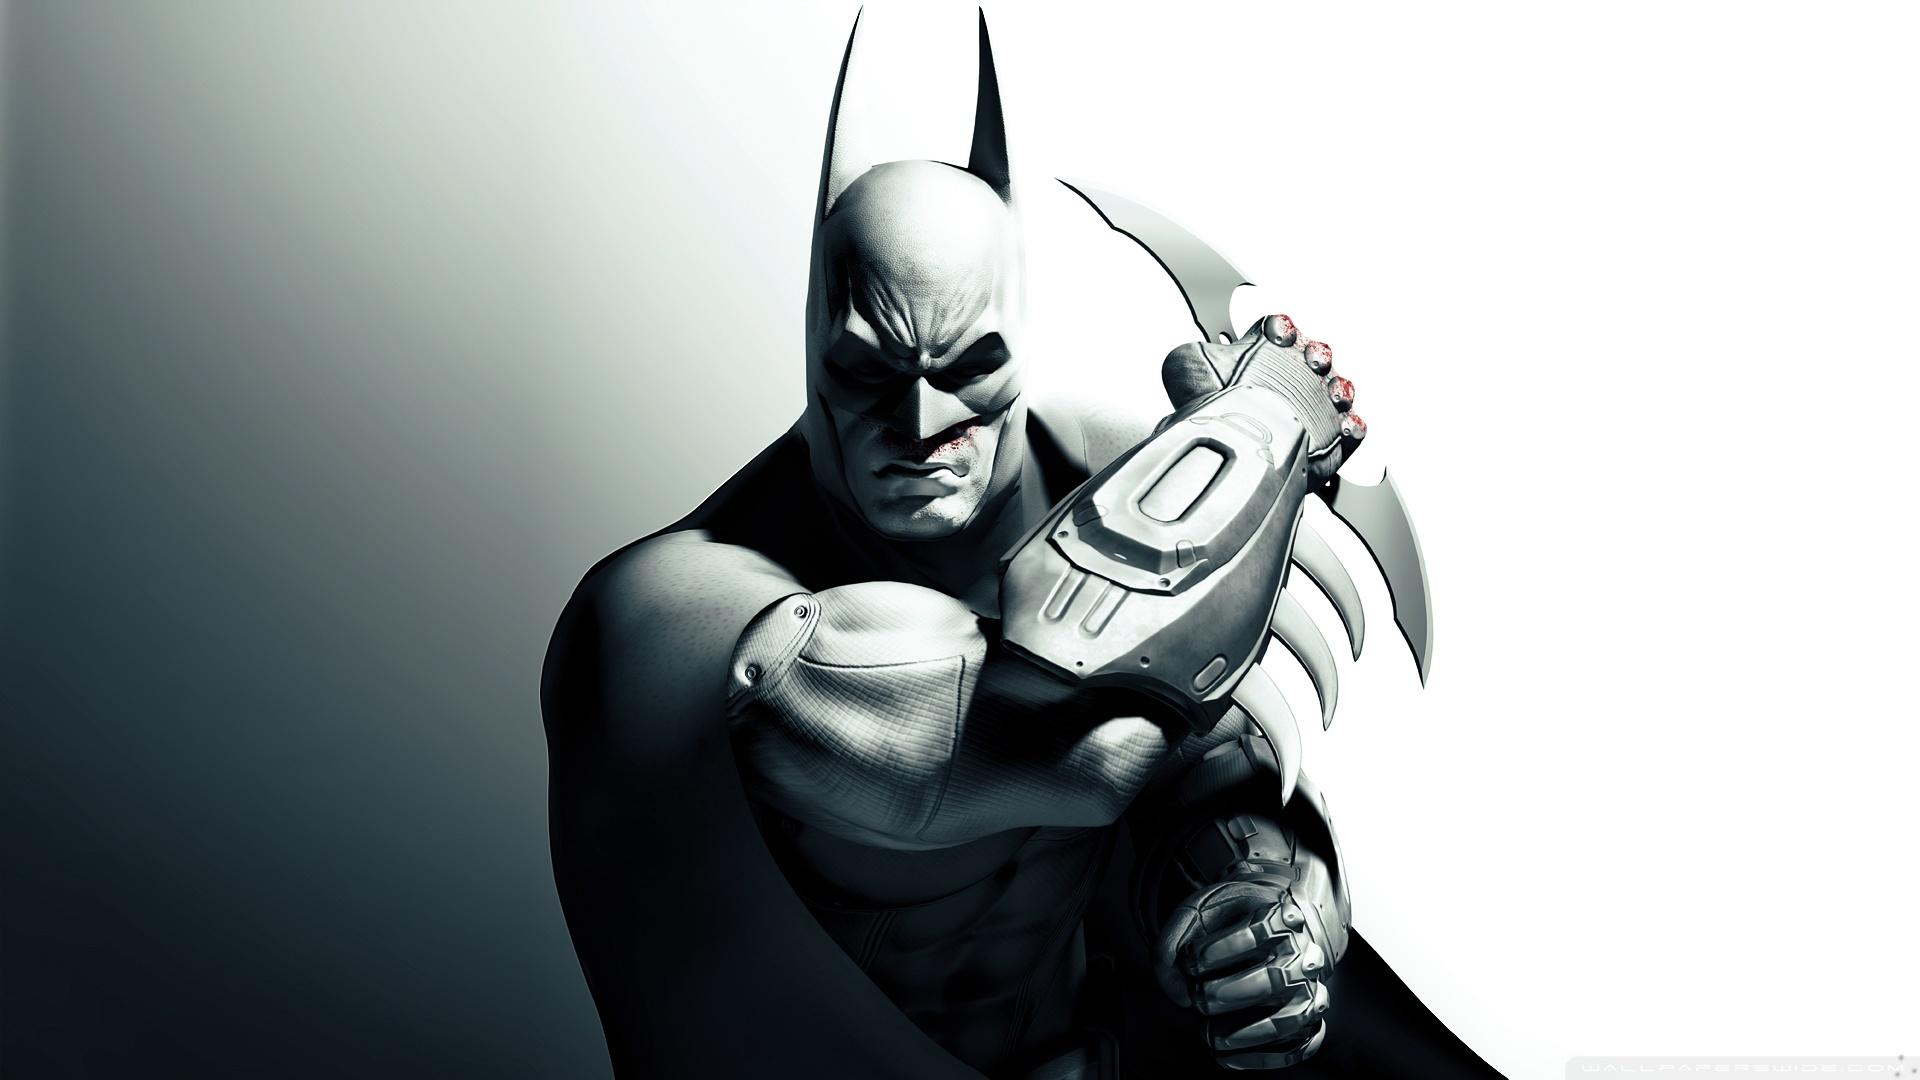 Free Download Image Batman Arkham City 3d Hd Wallpapersjpg Heroes